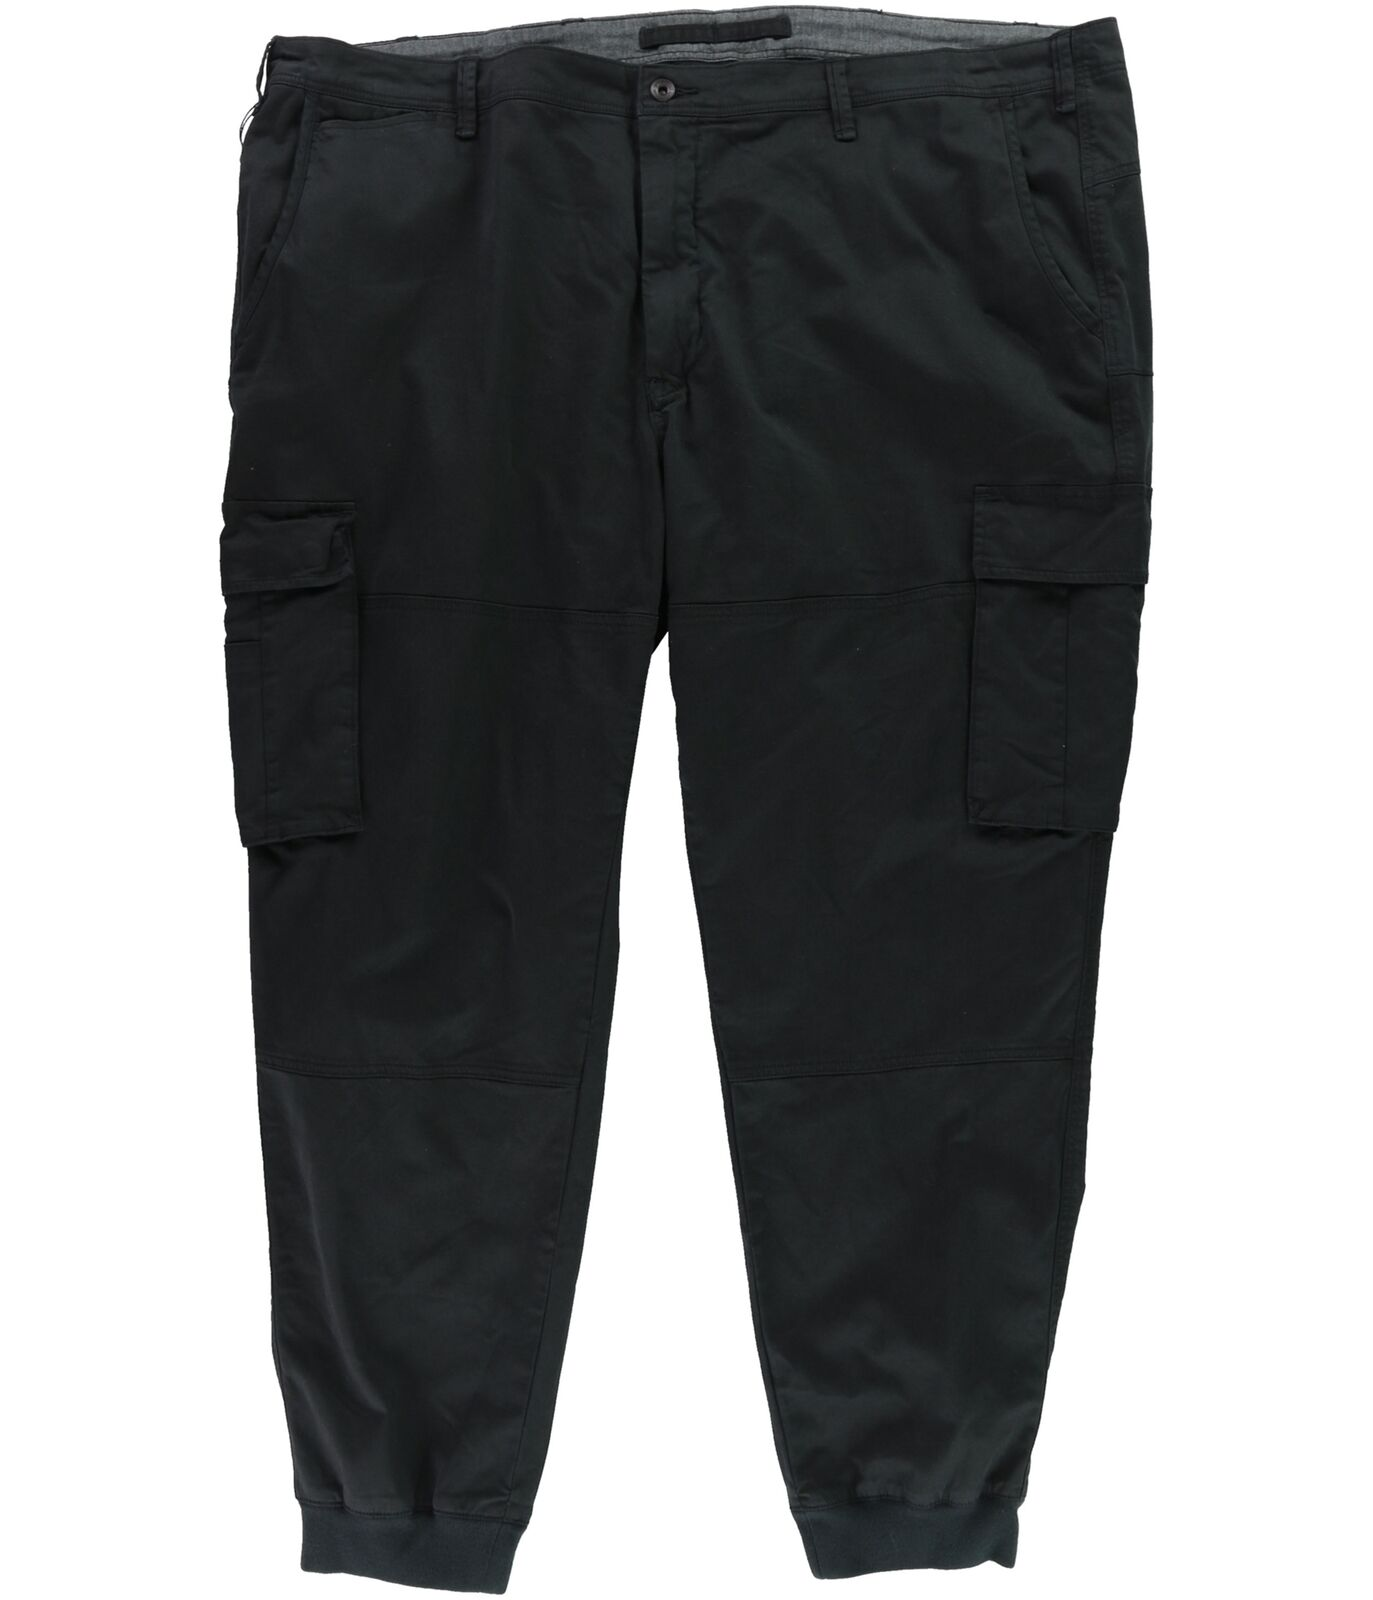 c19473e3b26d Ralph Lauren Classic-Fit Casual Cargo Pants Stretch Mens nedfac21476- Trousers